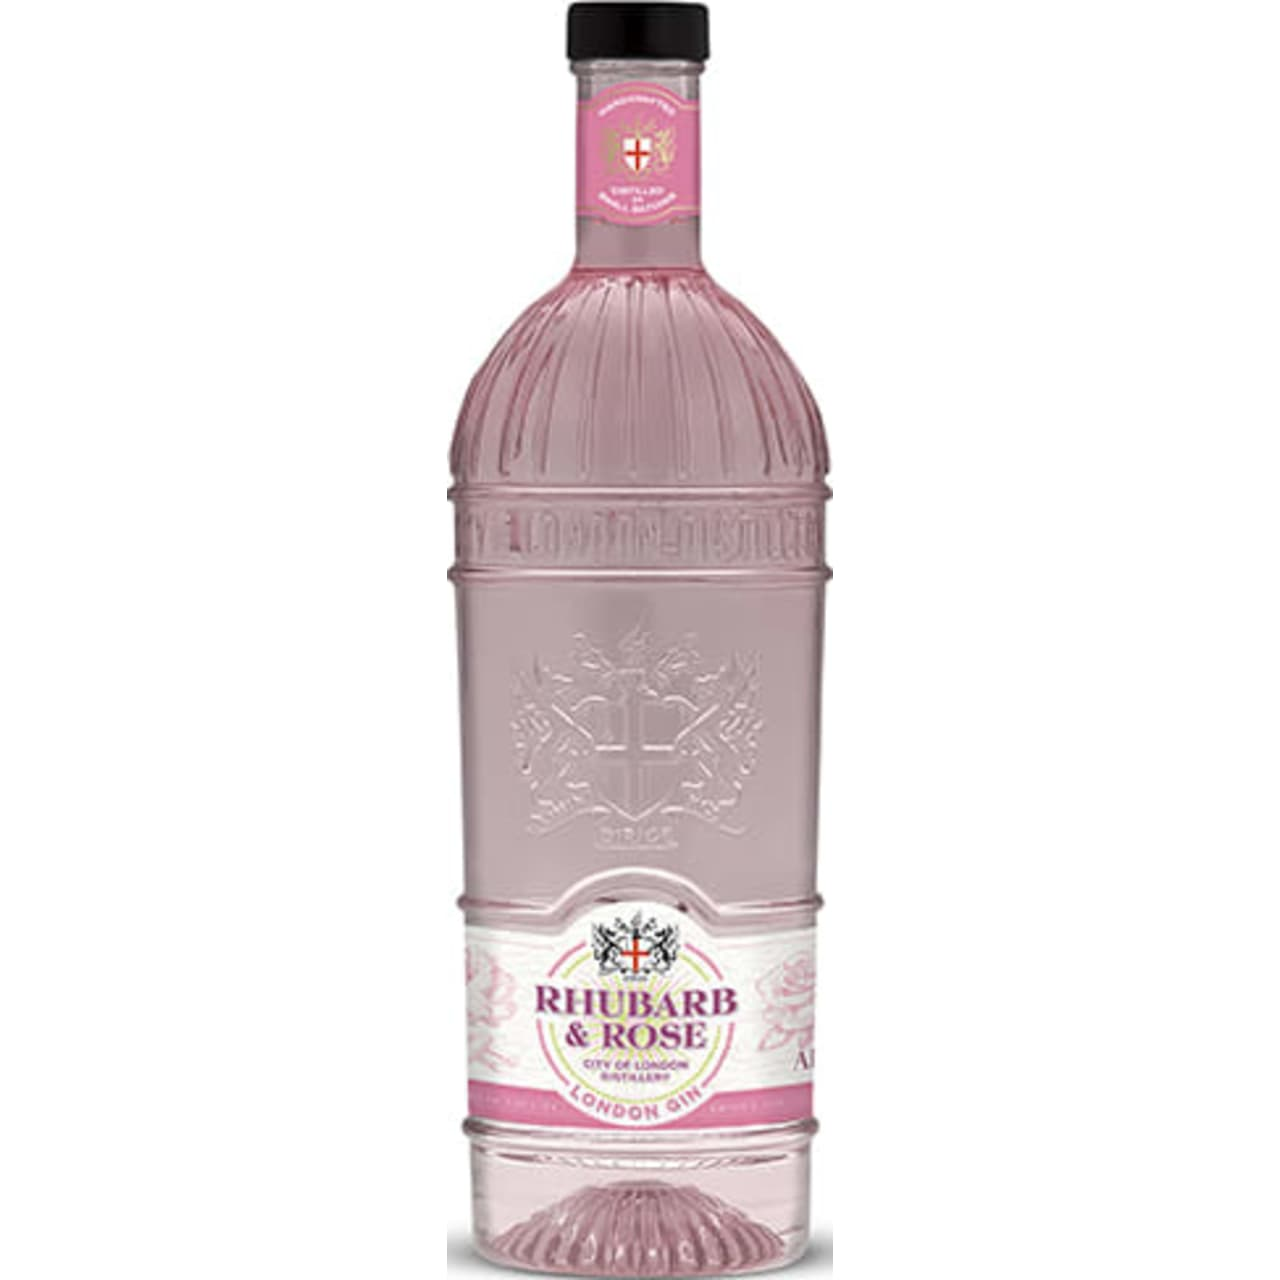 Product Image - City of London Rhubarb & Rose Gin